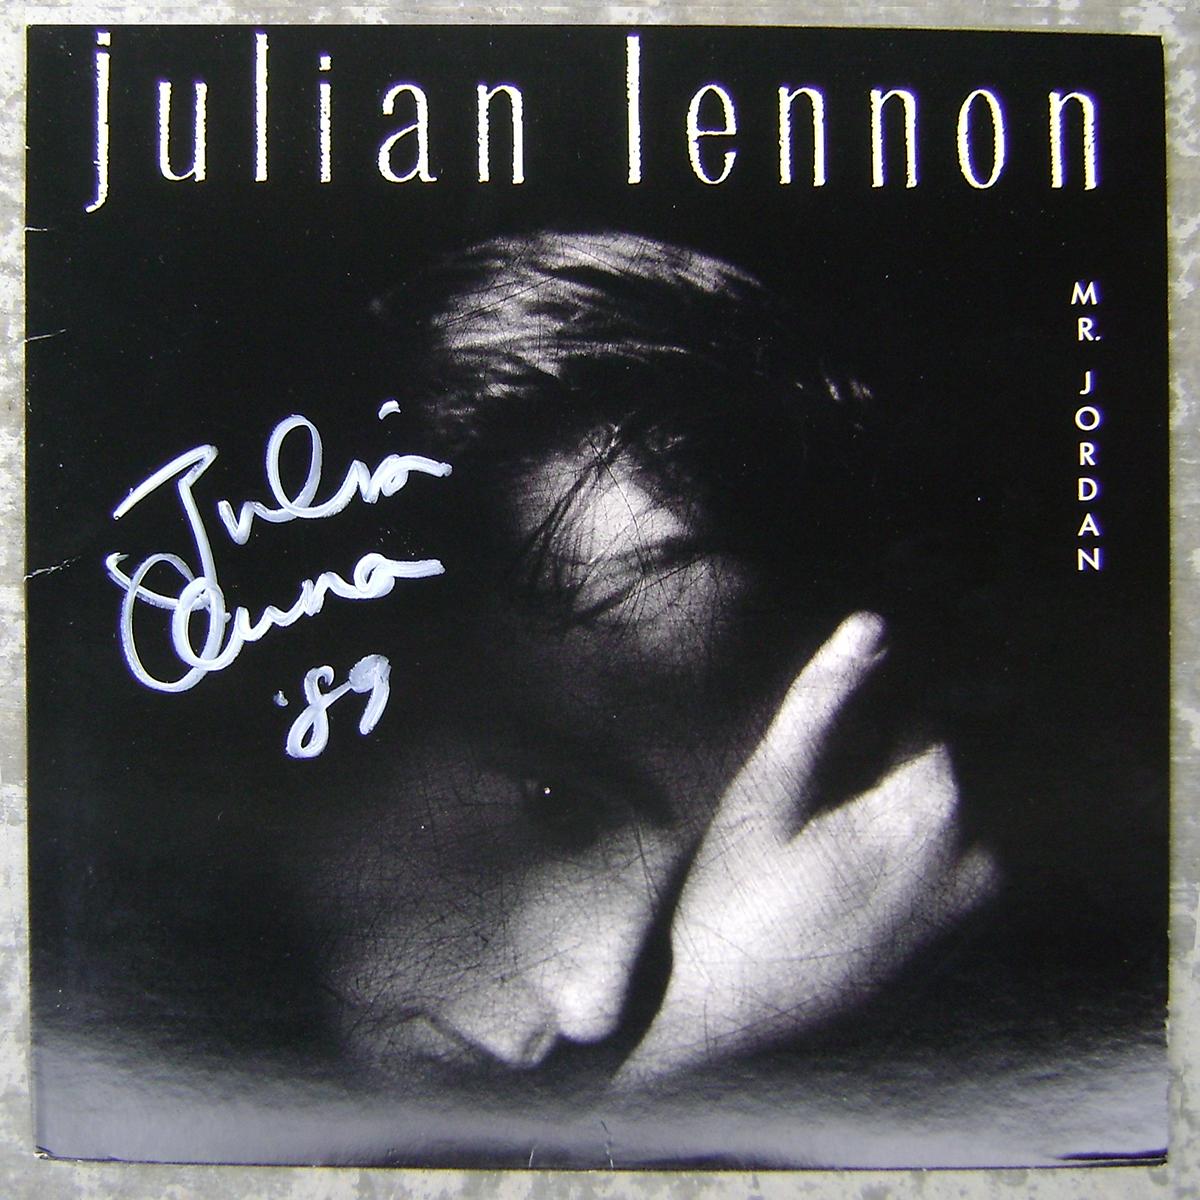 LP - Julian Lennon - Mr. Jordan